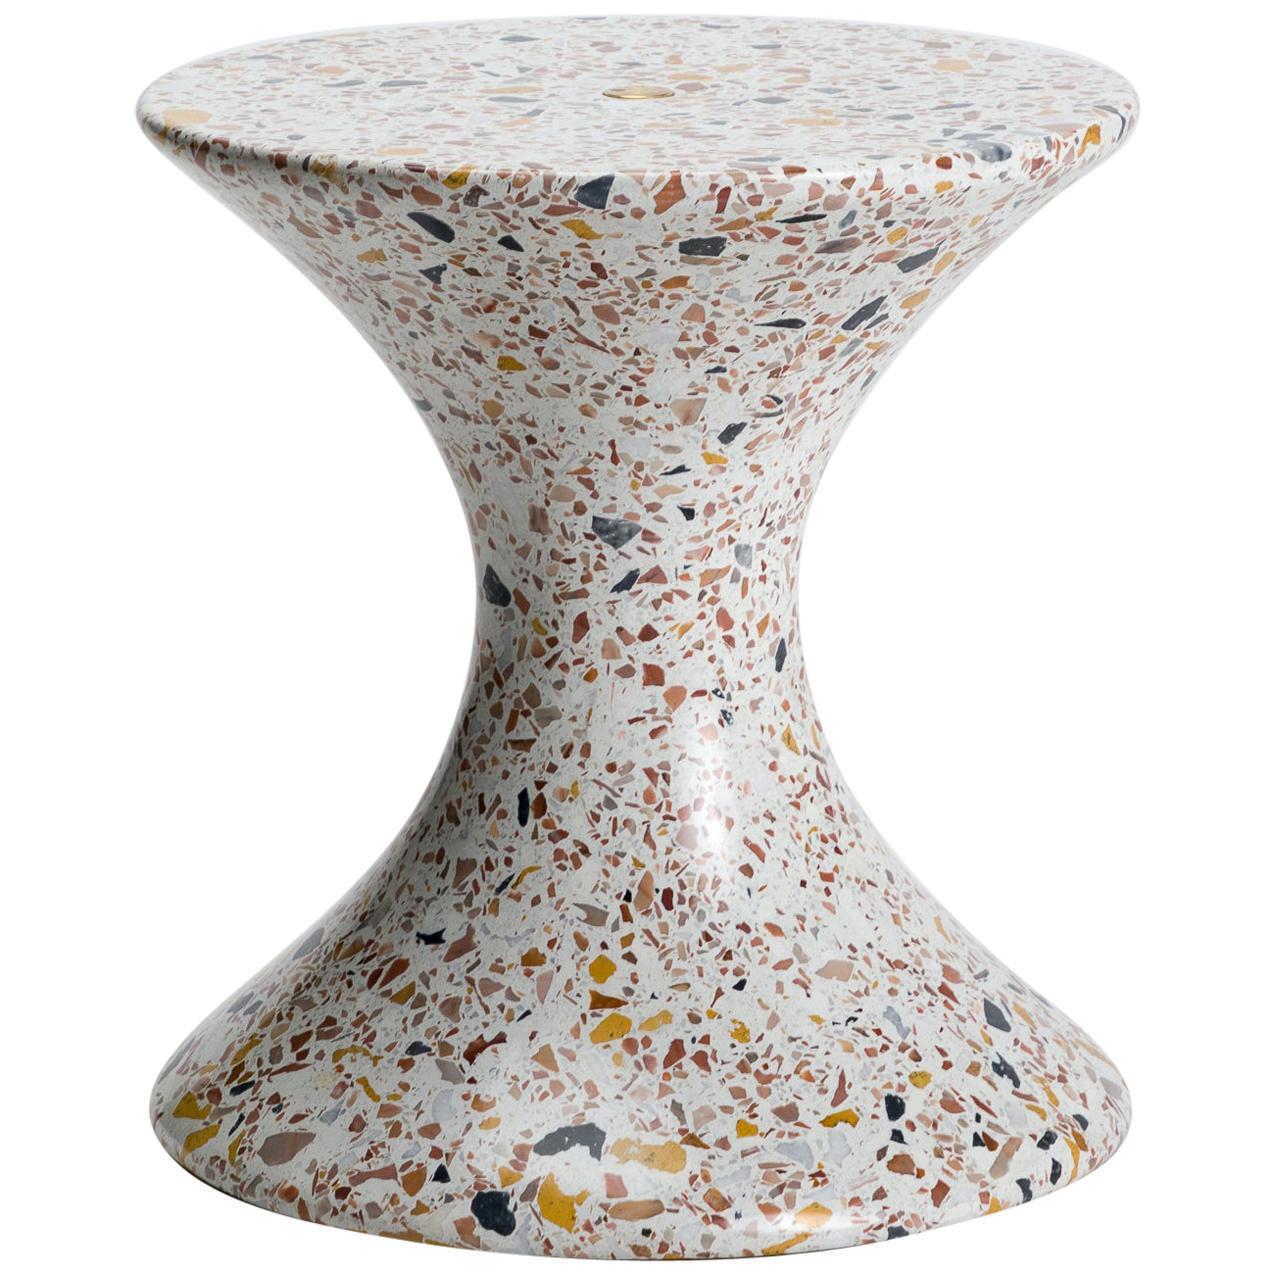 Confetti, Small Contemporary Indoor/Outdoor Terrazzo Side Table by Laun